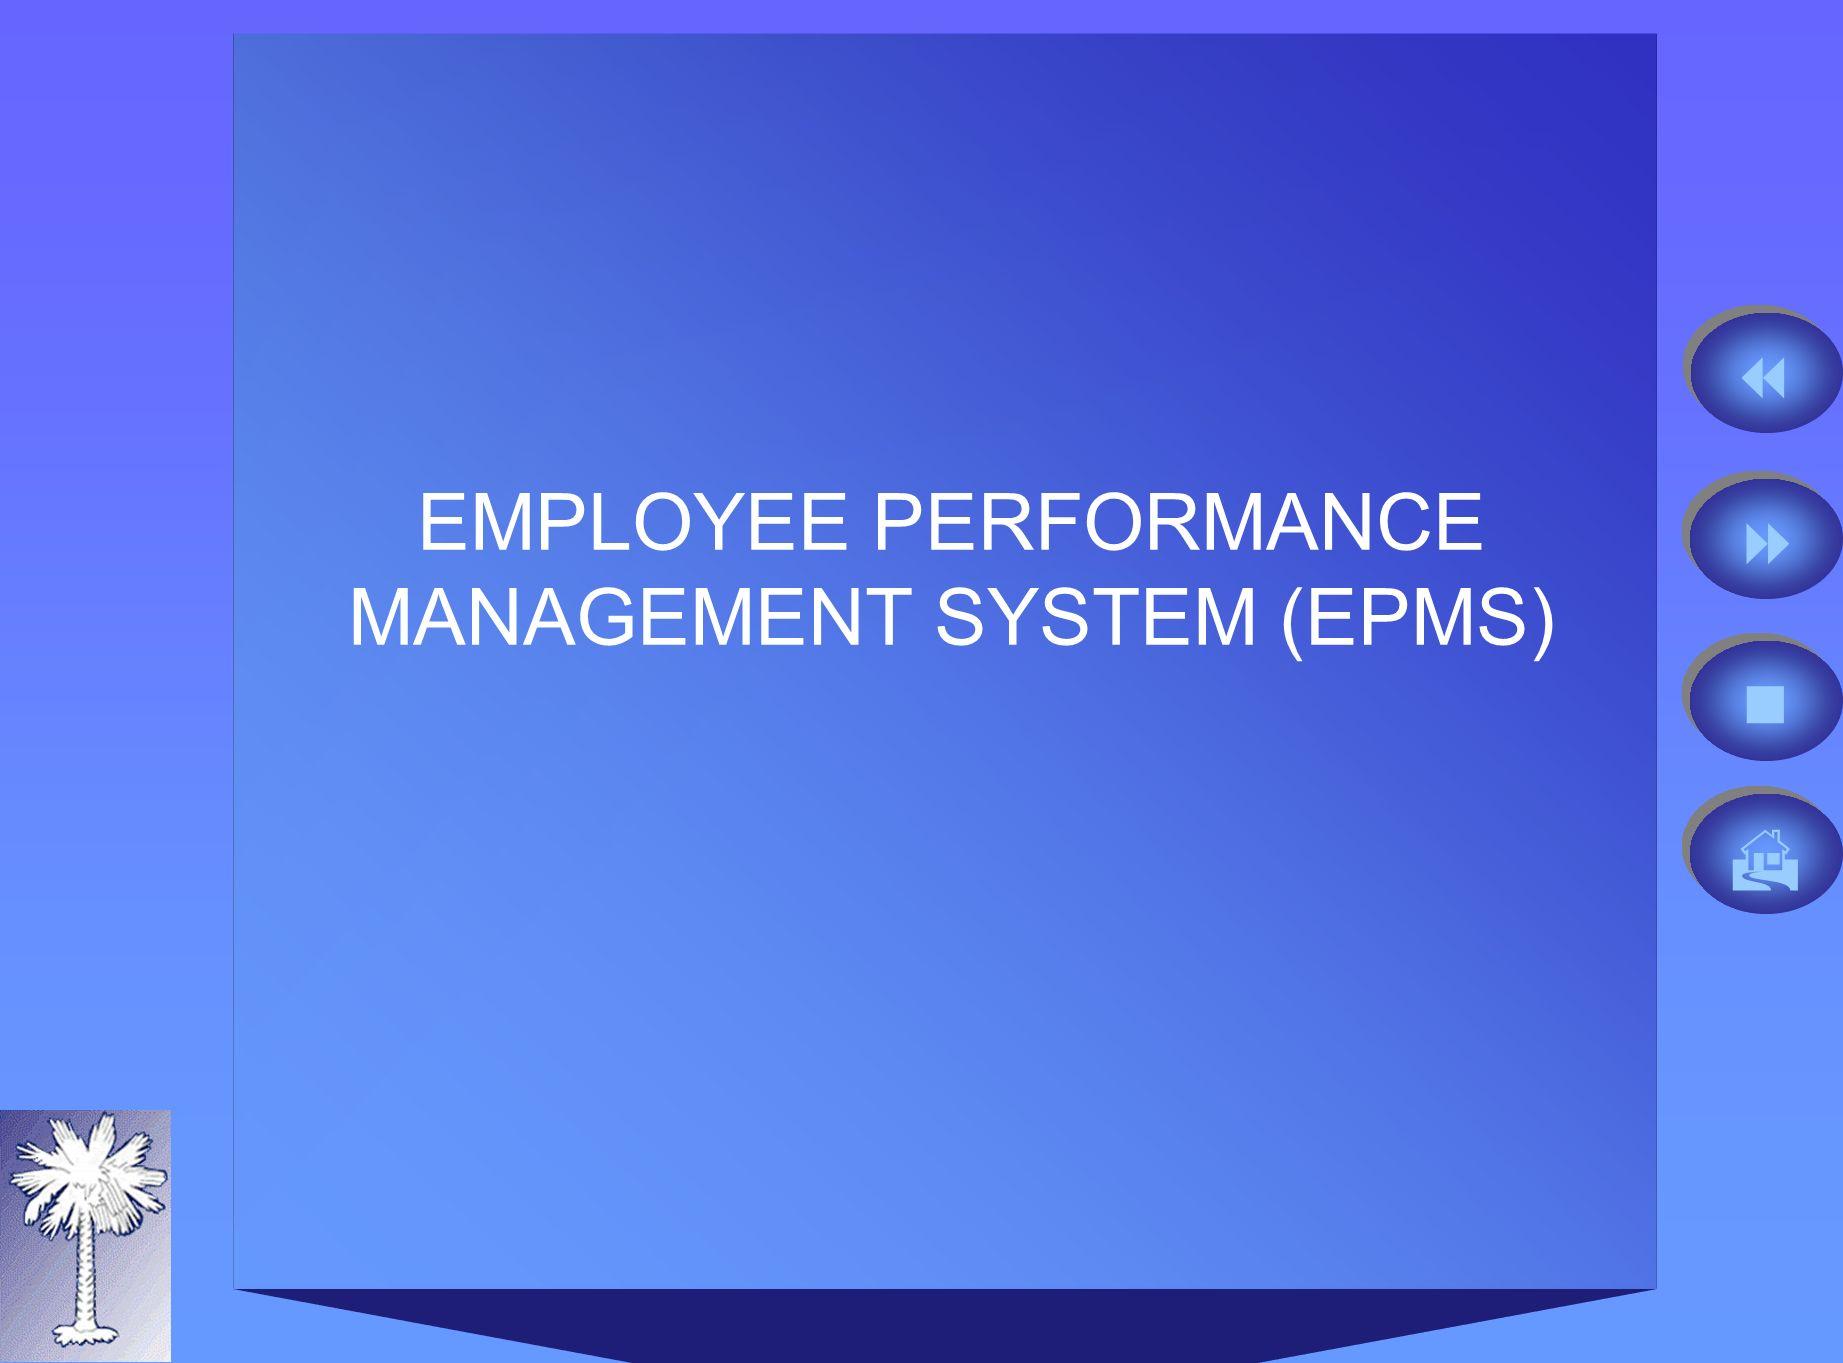 EMPLOYEE PERFORMANCE MANAGEMENT SYSTEM (EPMS)